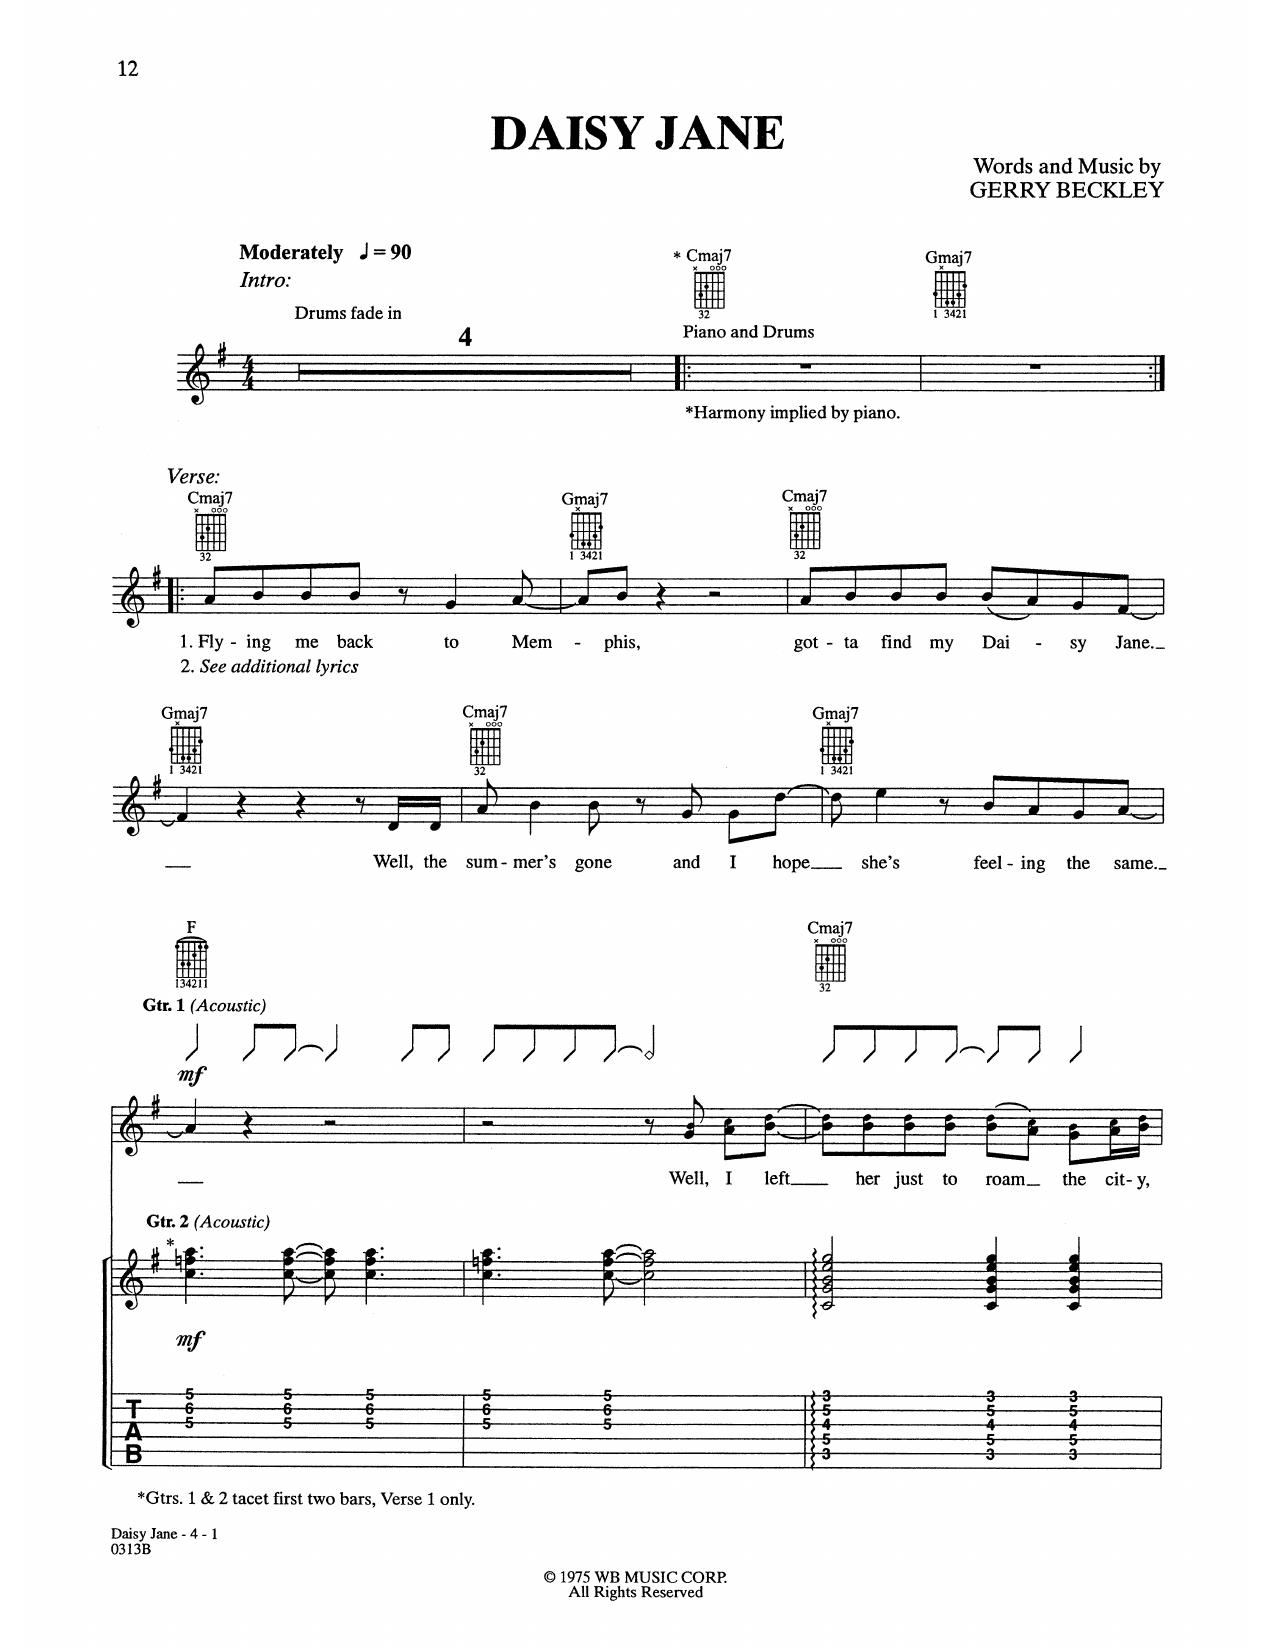 Daisy Jane Sheet Music